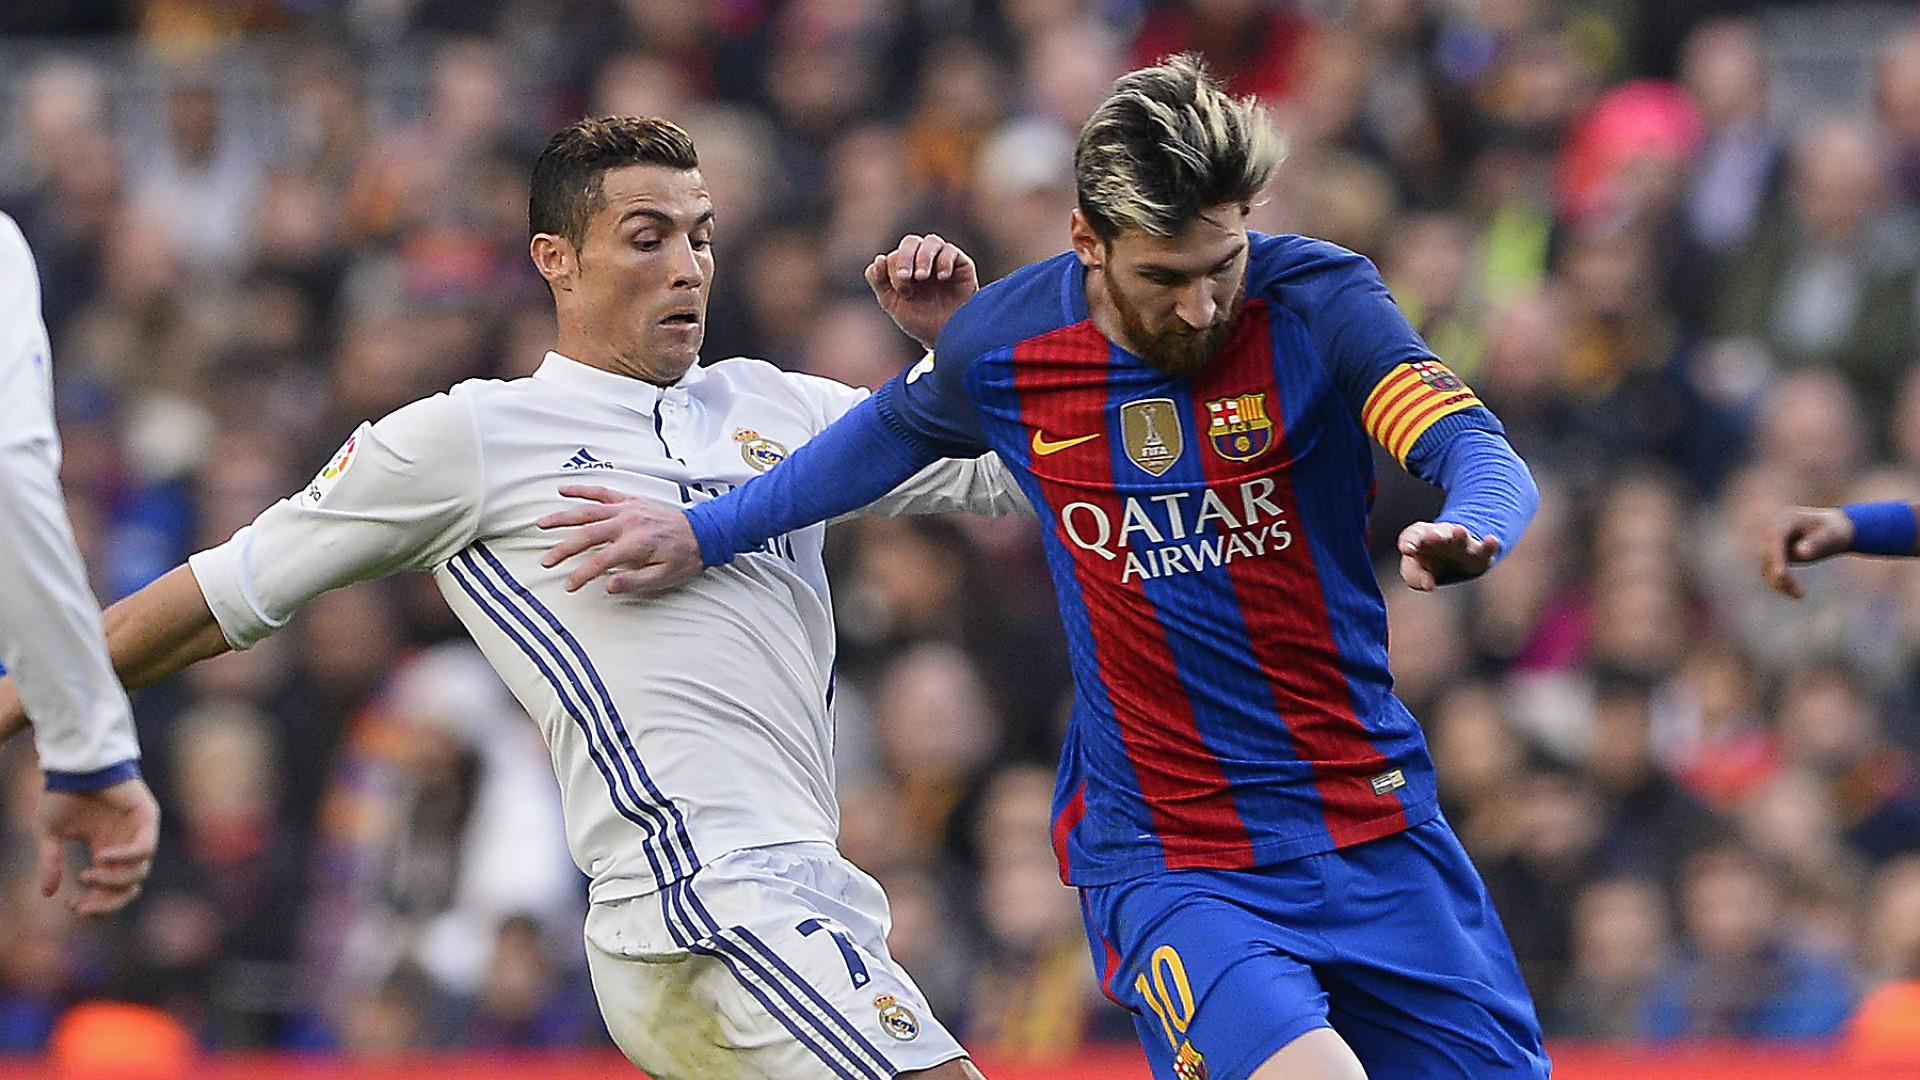 Ronaldo vs Messi Wallpaper 2018 (77+ images)